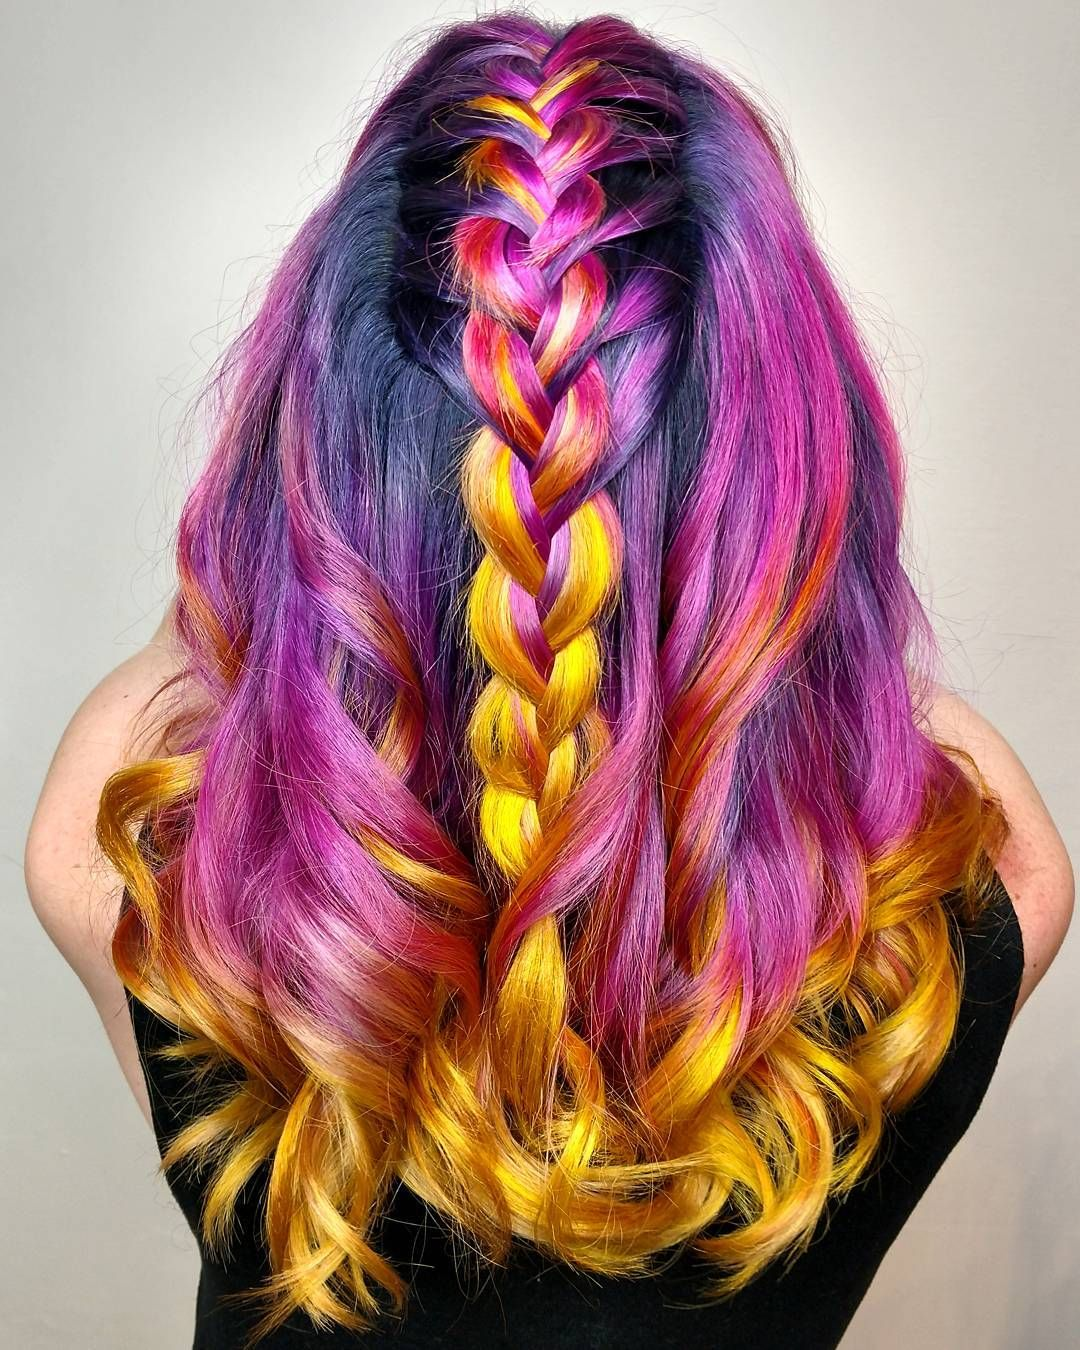 Hawaiian tropic sunset hair pulpriothair pulpriot